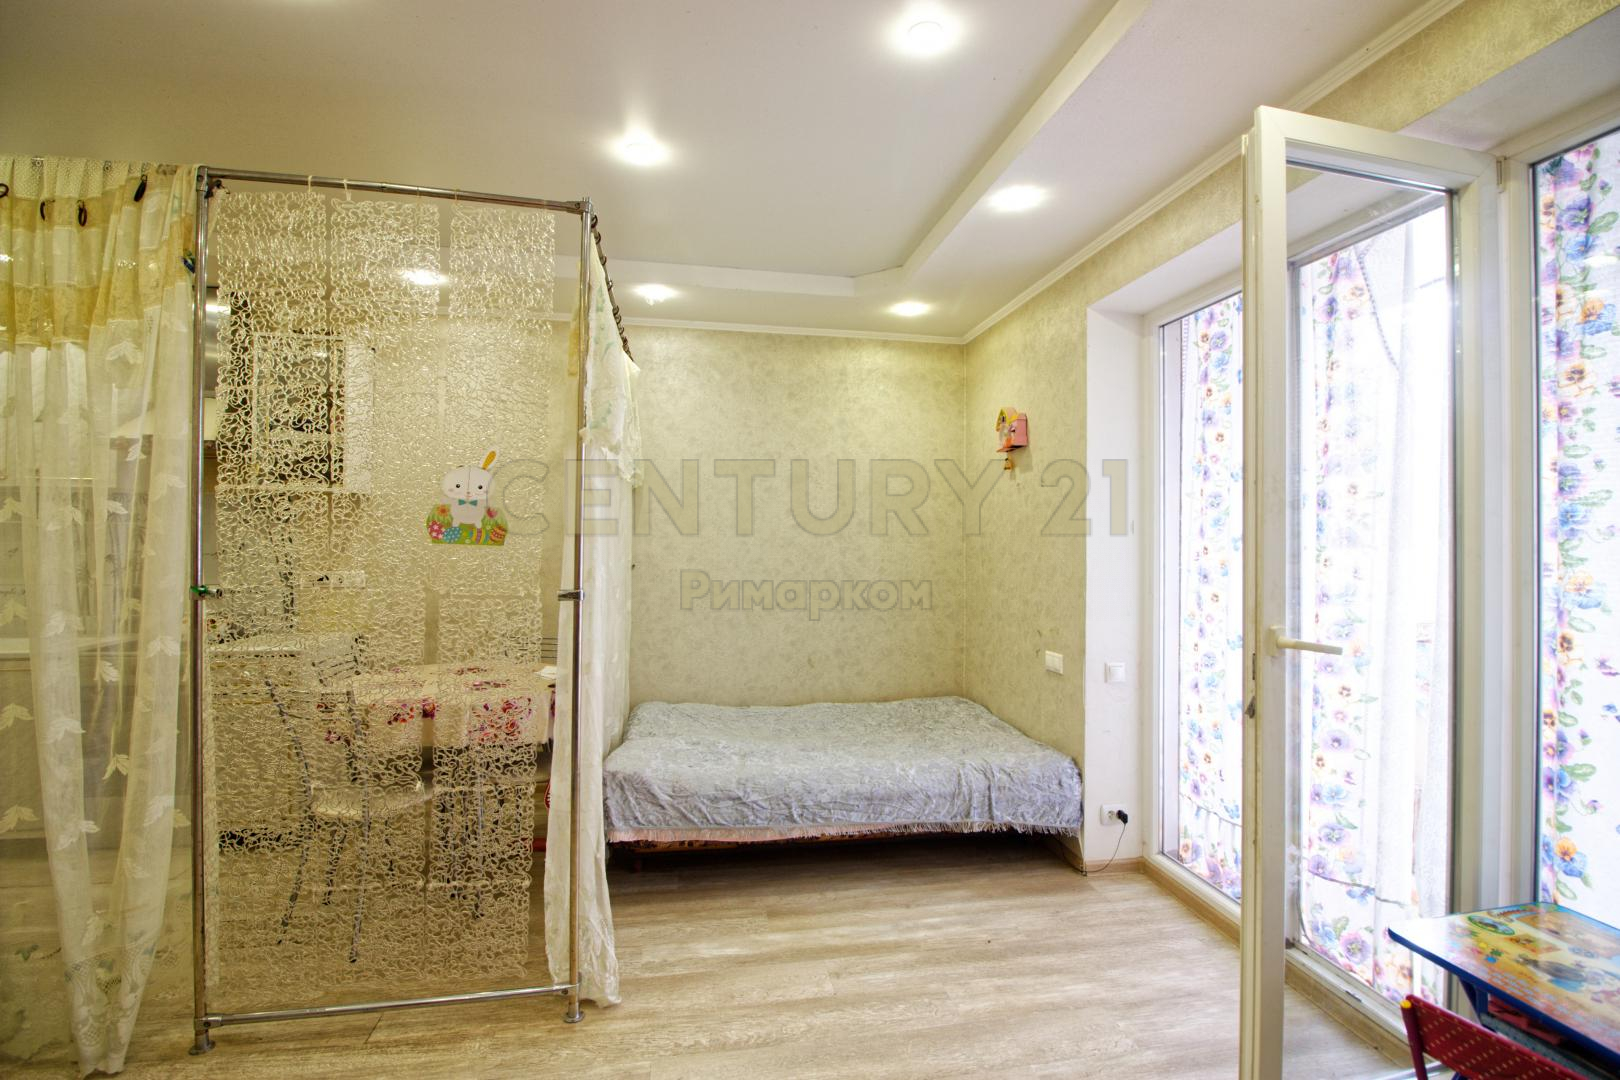 Продается однокомнатная квартира за 1 590 000 рублей. Московская обл, г Чехов, ул Русская, д 36А.